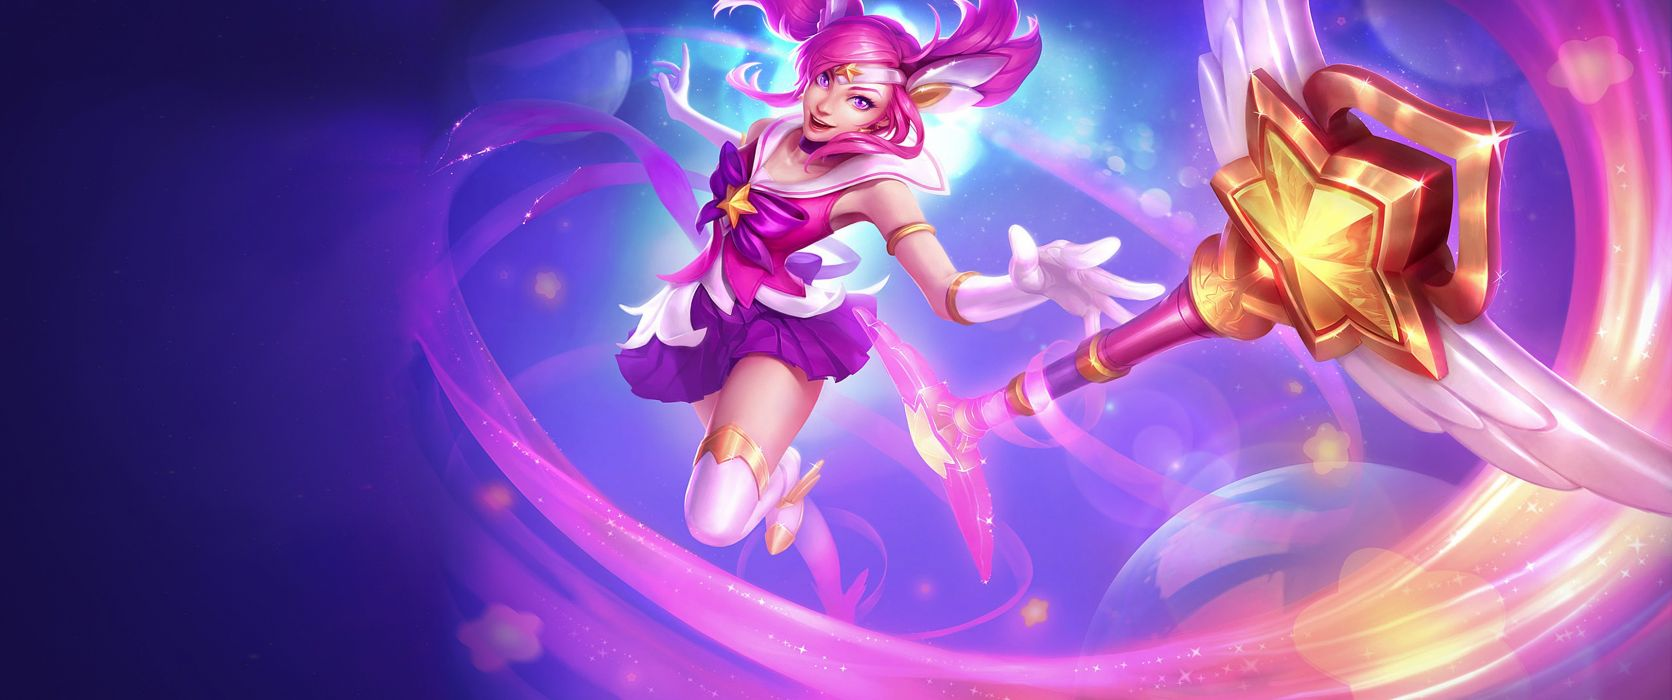 League Legends Fantasy Art Artwork Wallpaper 3440x1440 849378